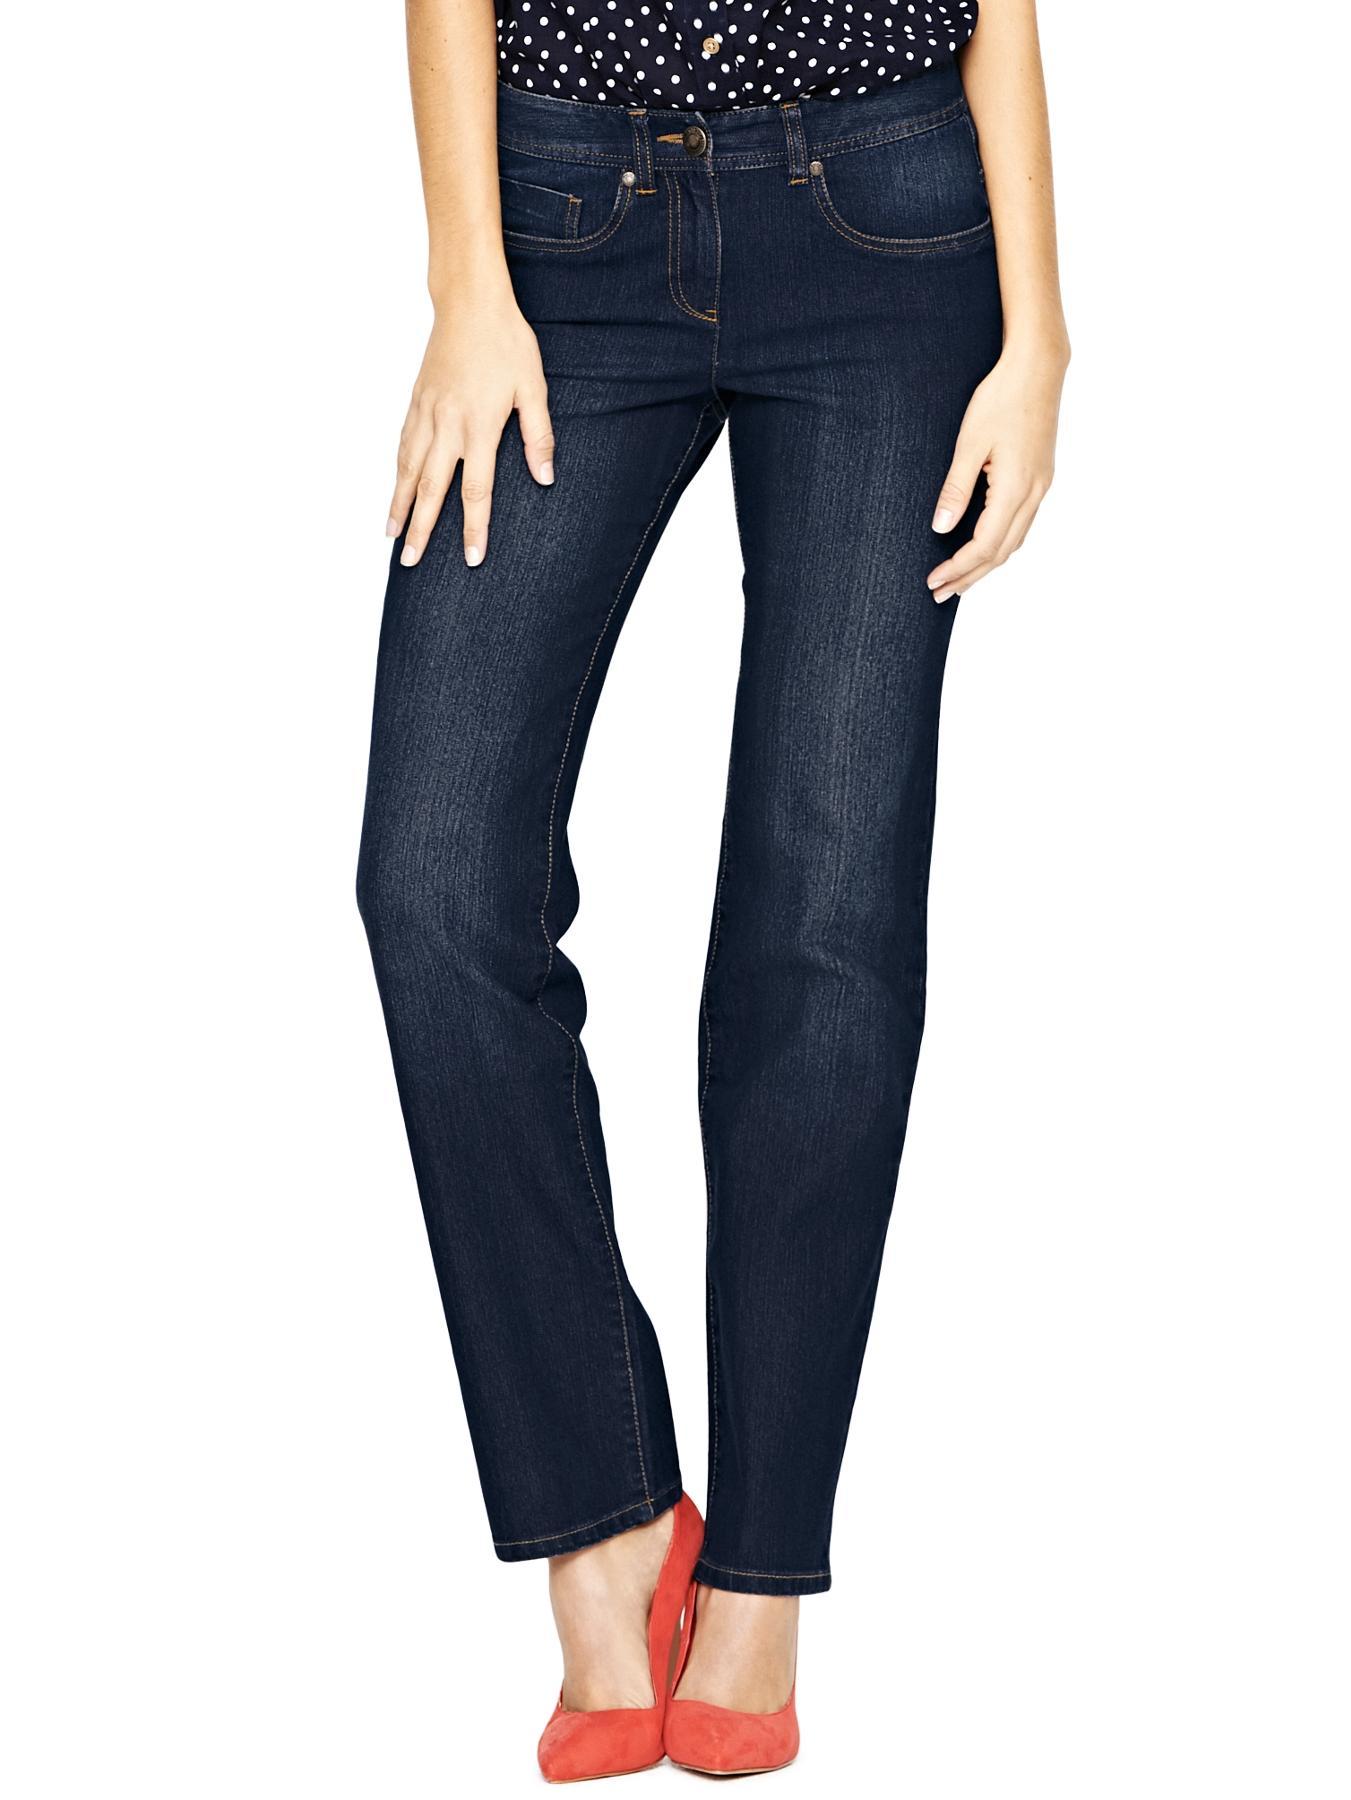 south-petite-slim-leg-jeans